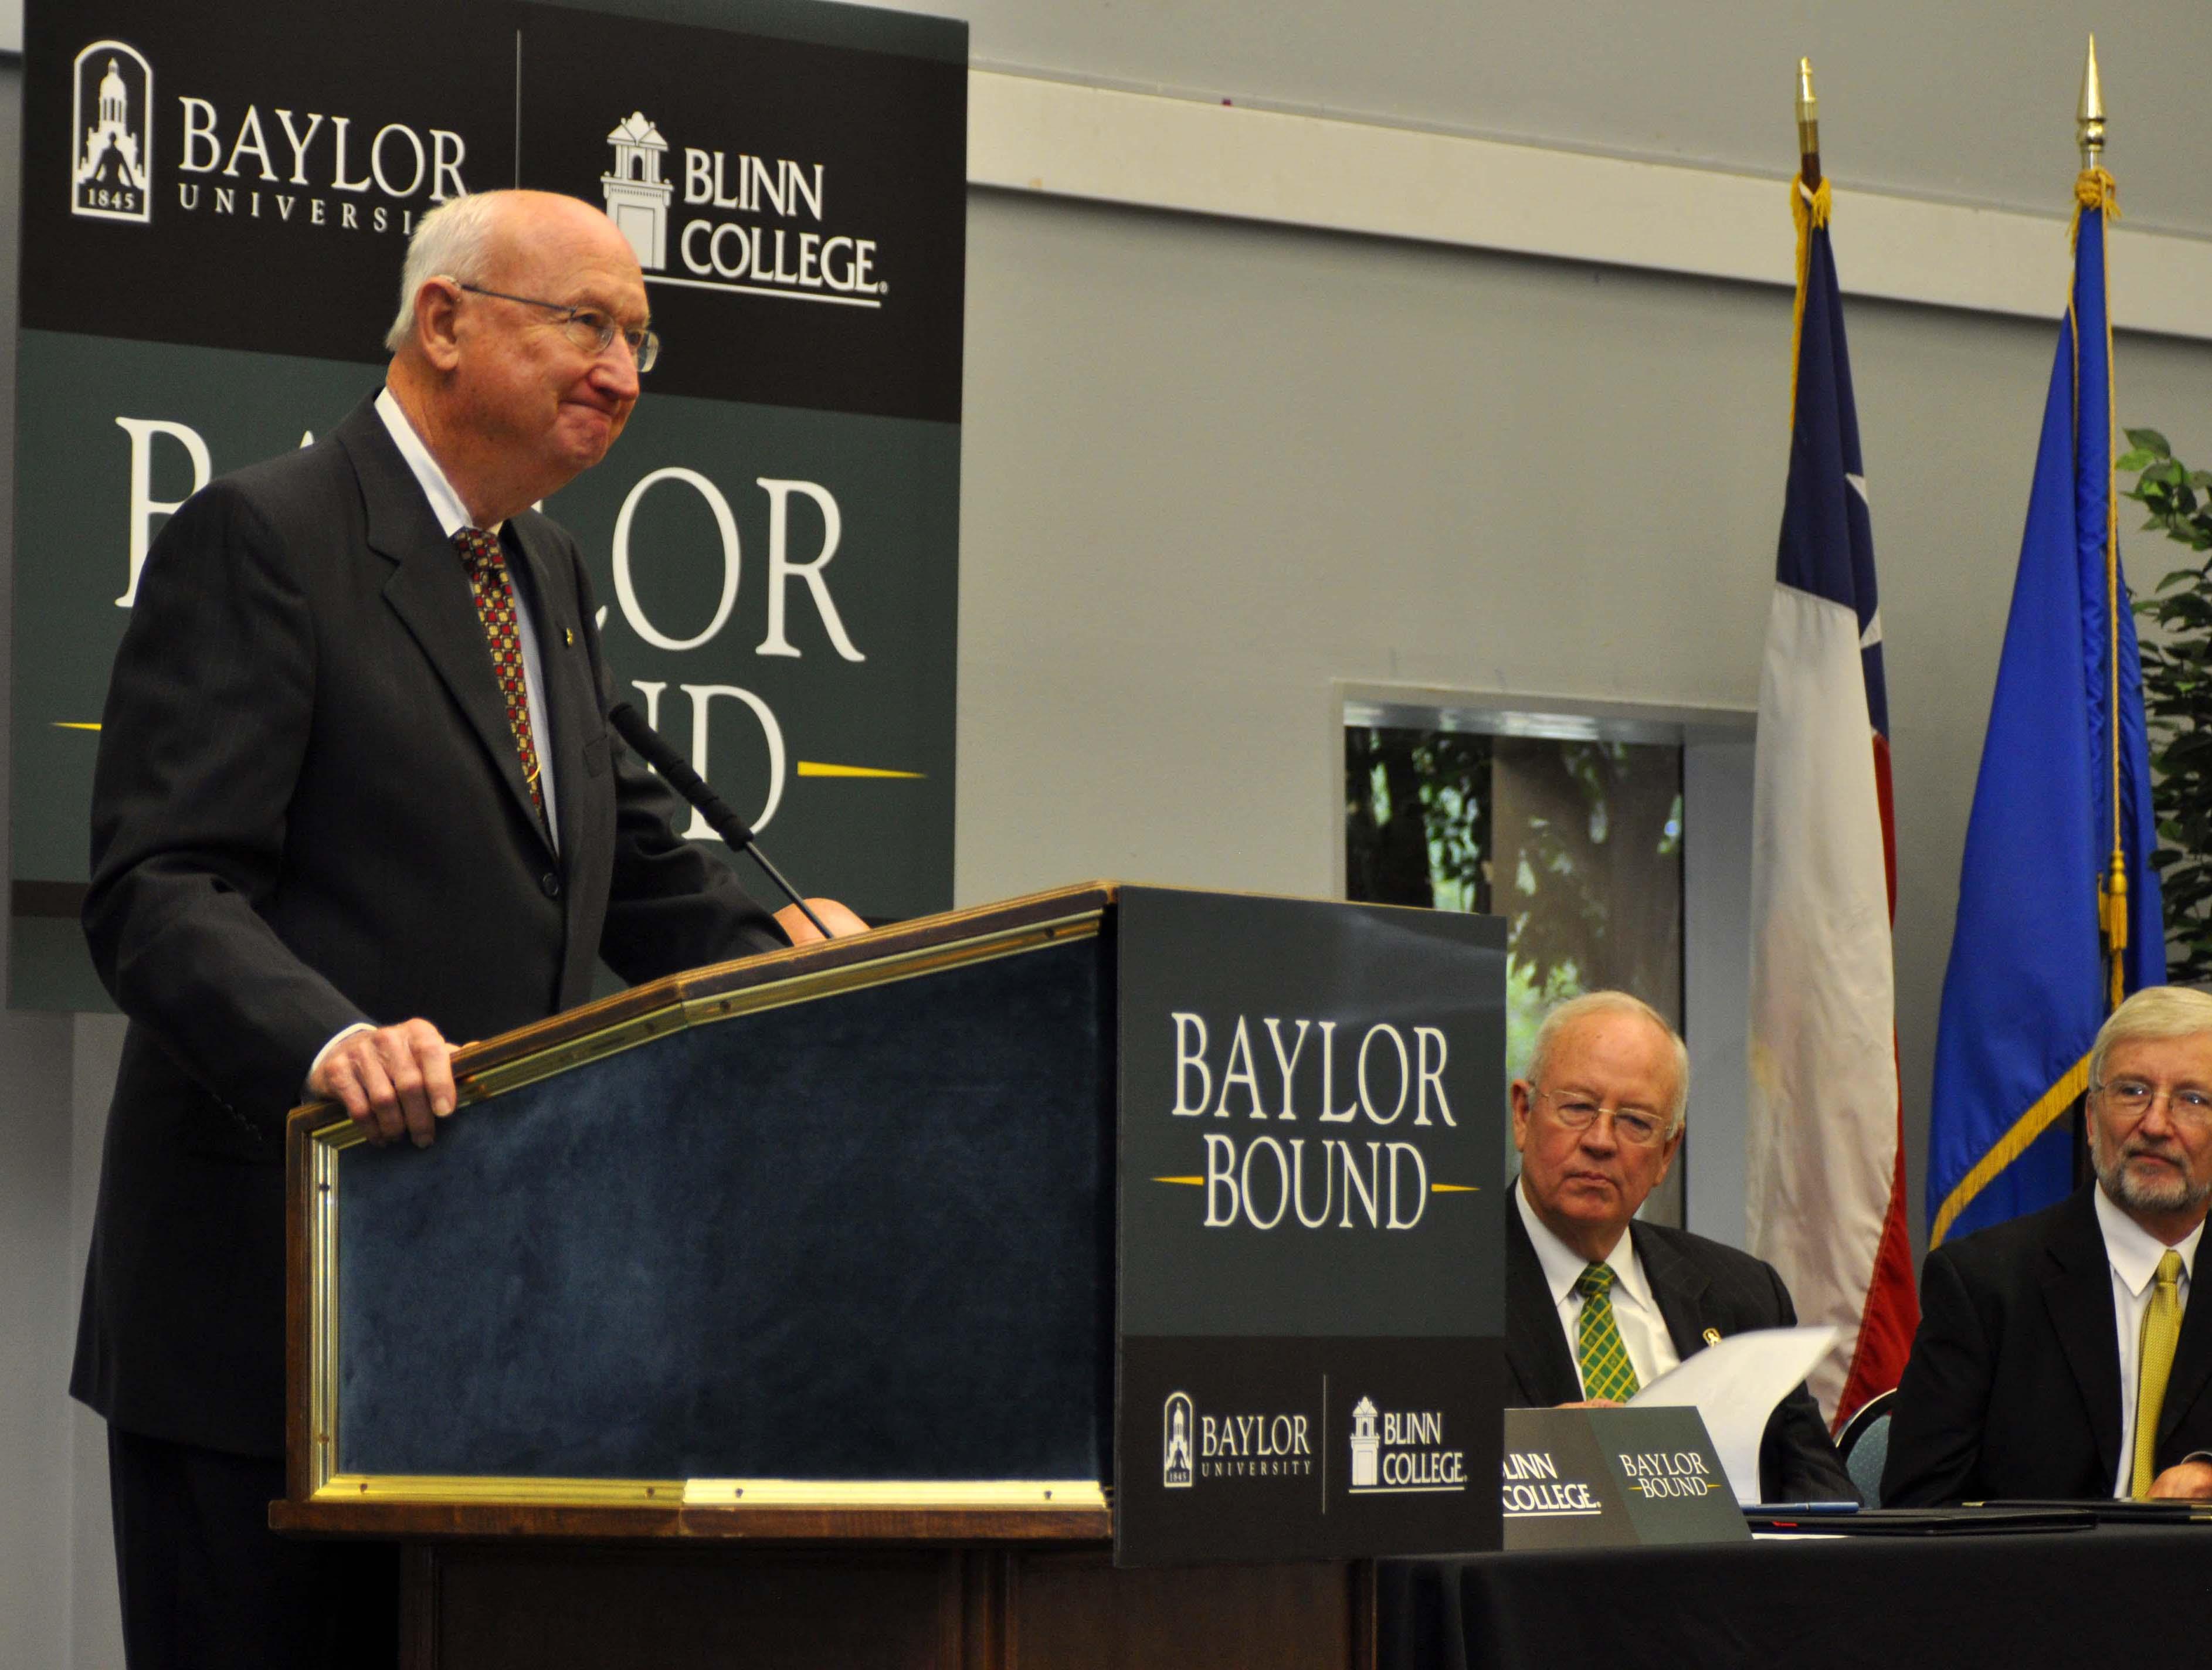 Baylor University And Blinn College Announce Partnership On New